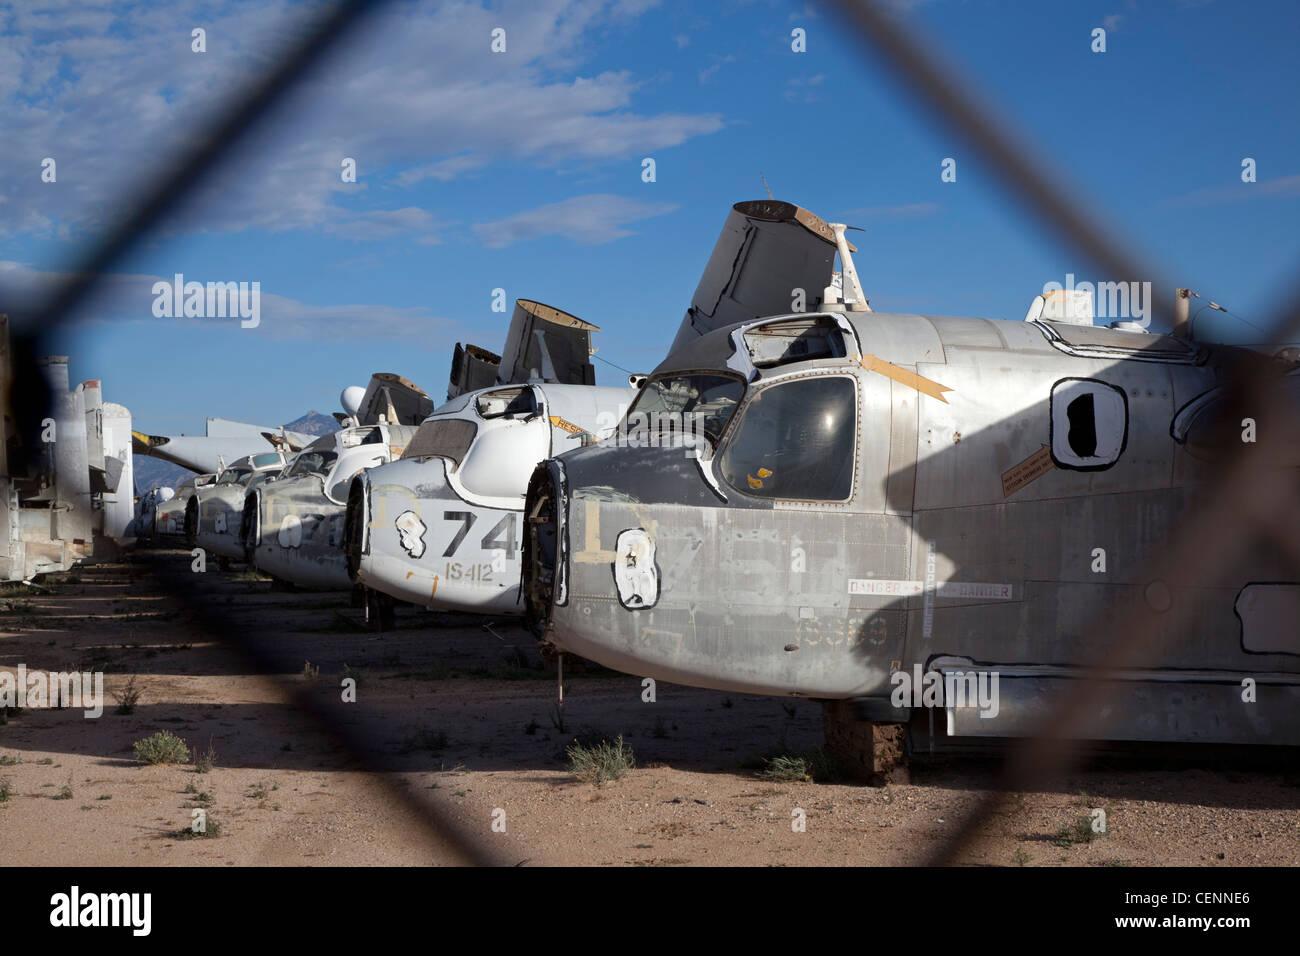 Tucson, Arizona - A military aircraft salvage yard next to Stock